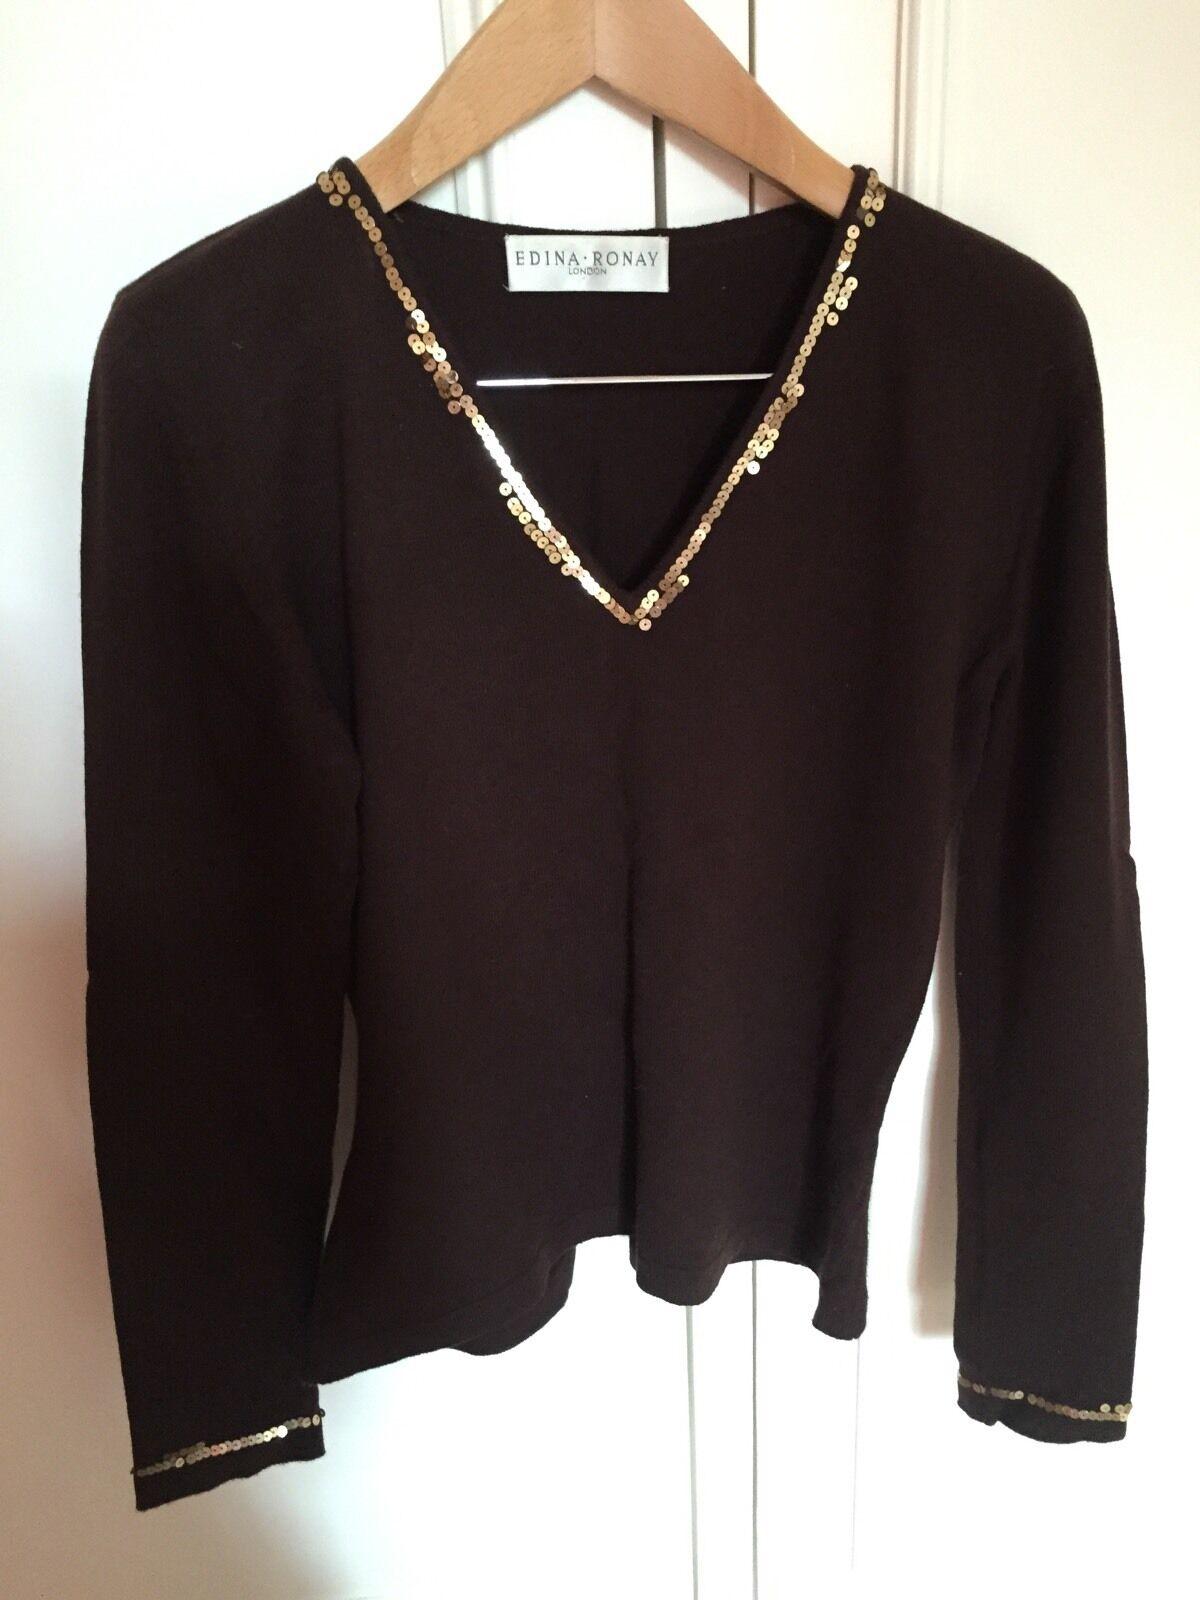 Edina Ronay Embellished Wool Designer Top Size S